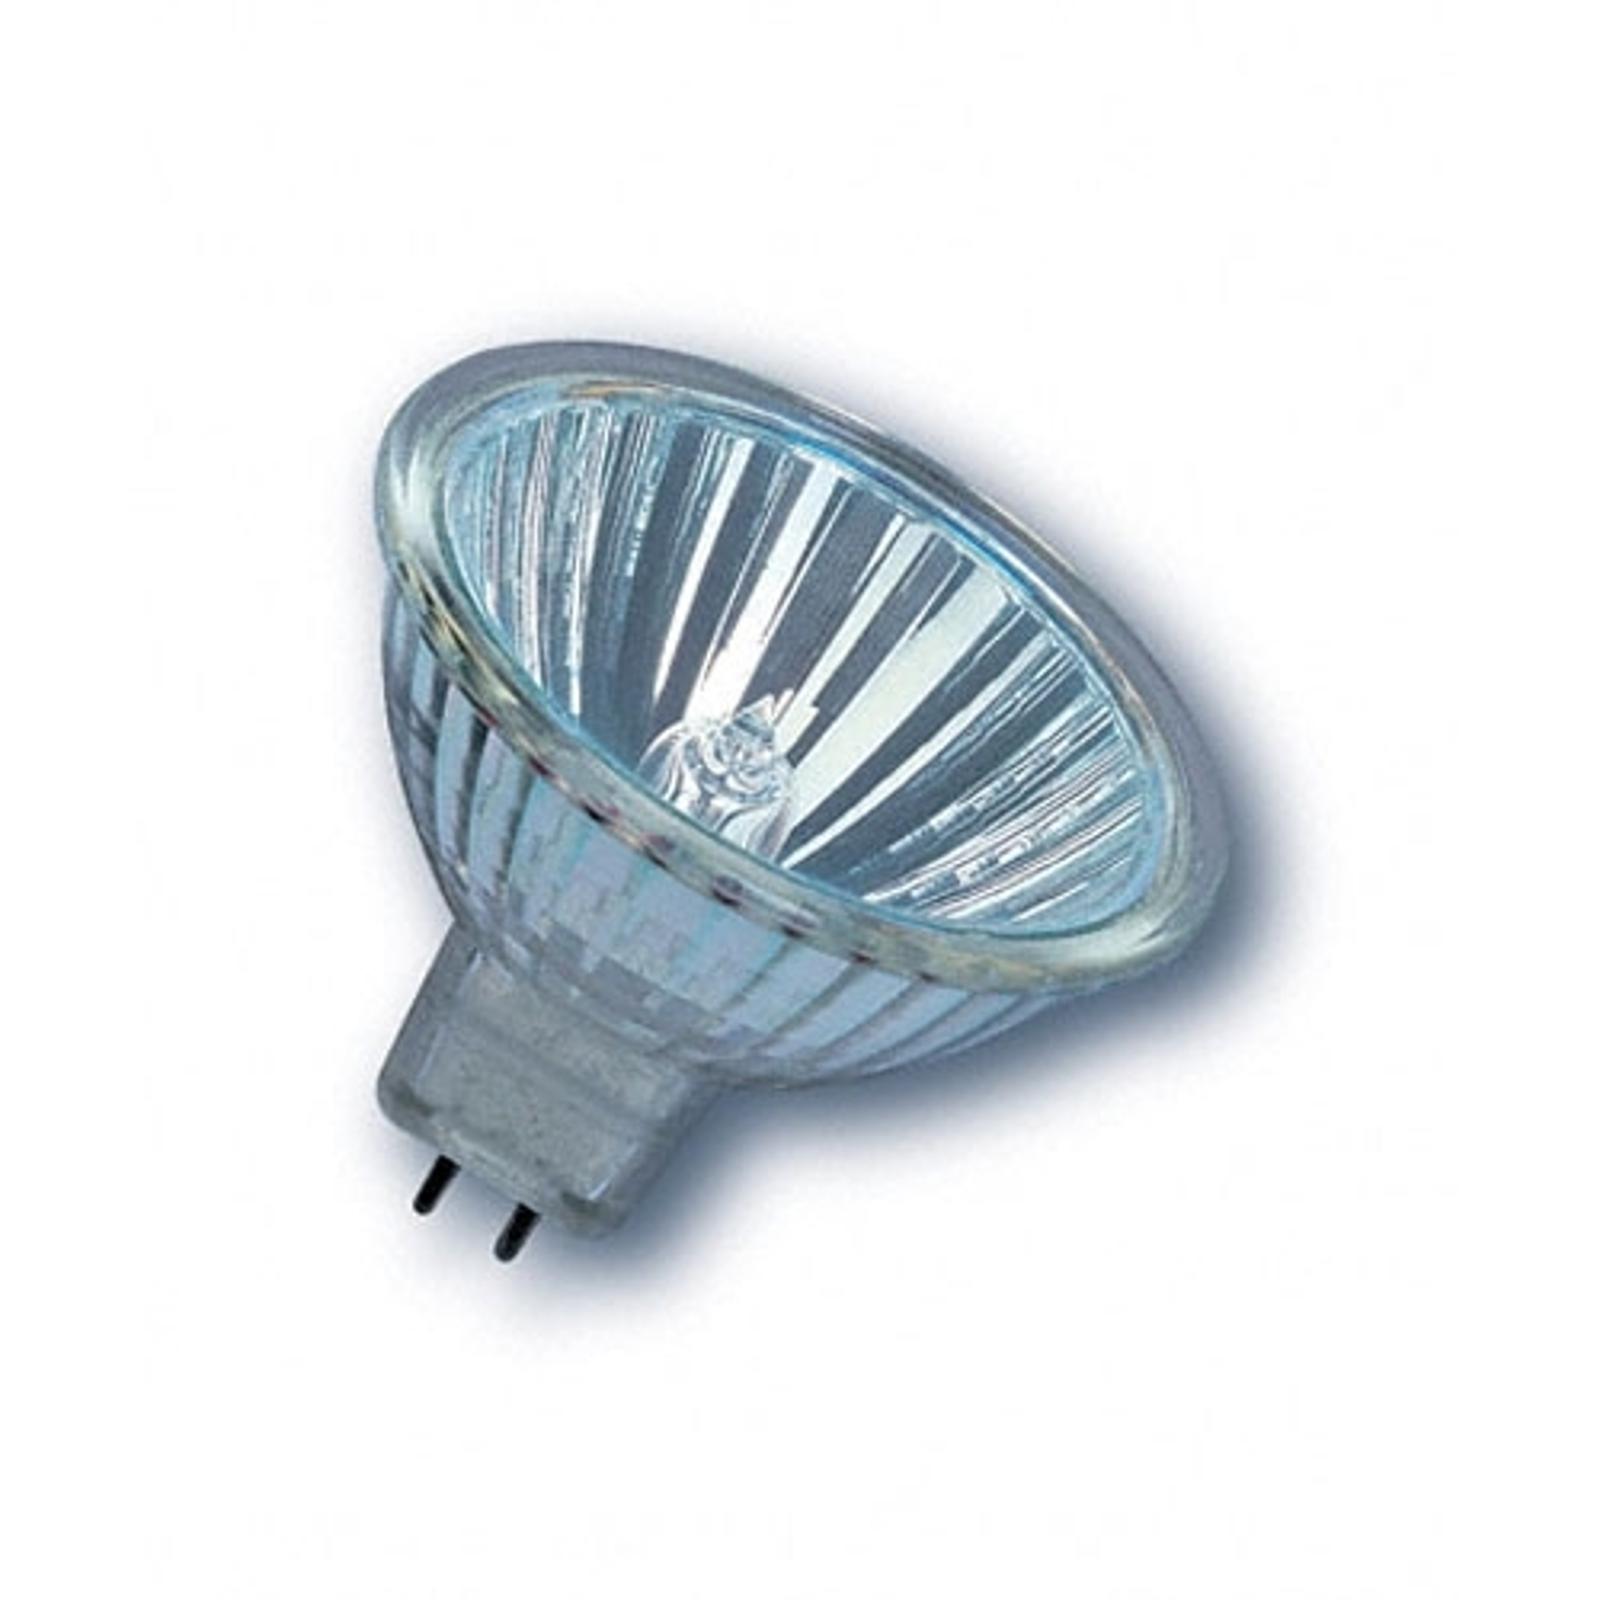 Lampa halogen GU5,3 MR16 Decostar 51 Titan 20W 36